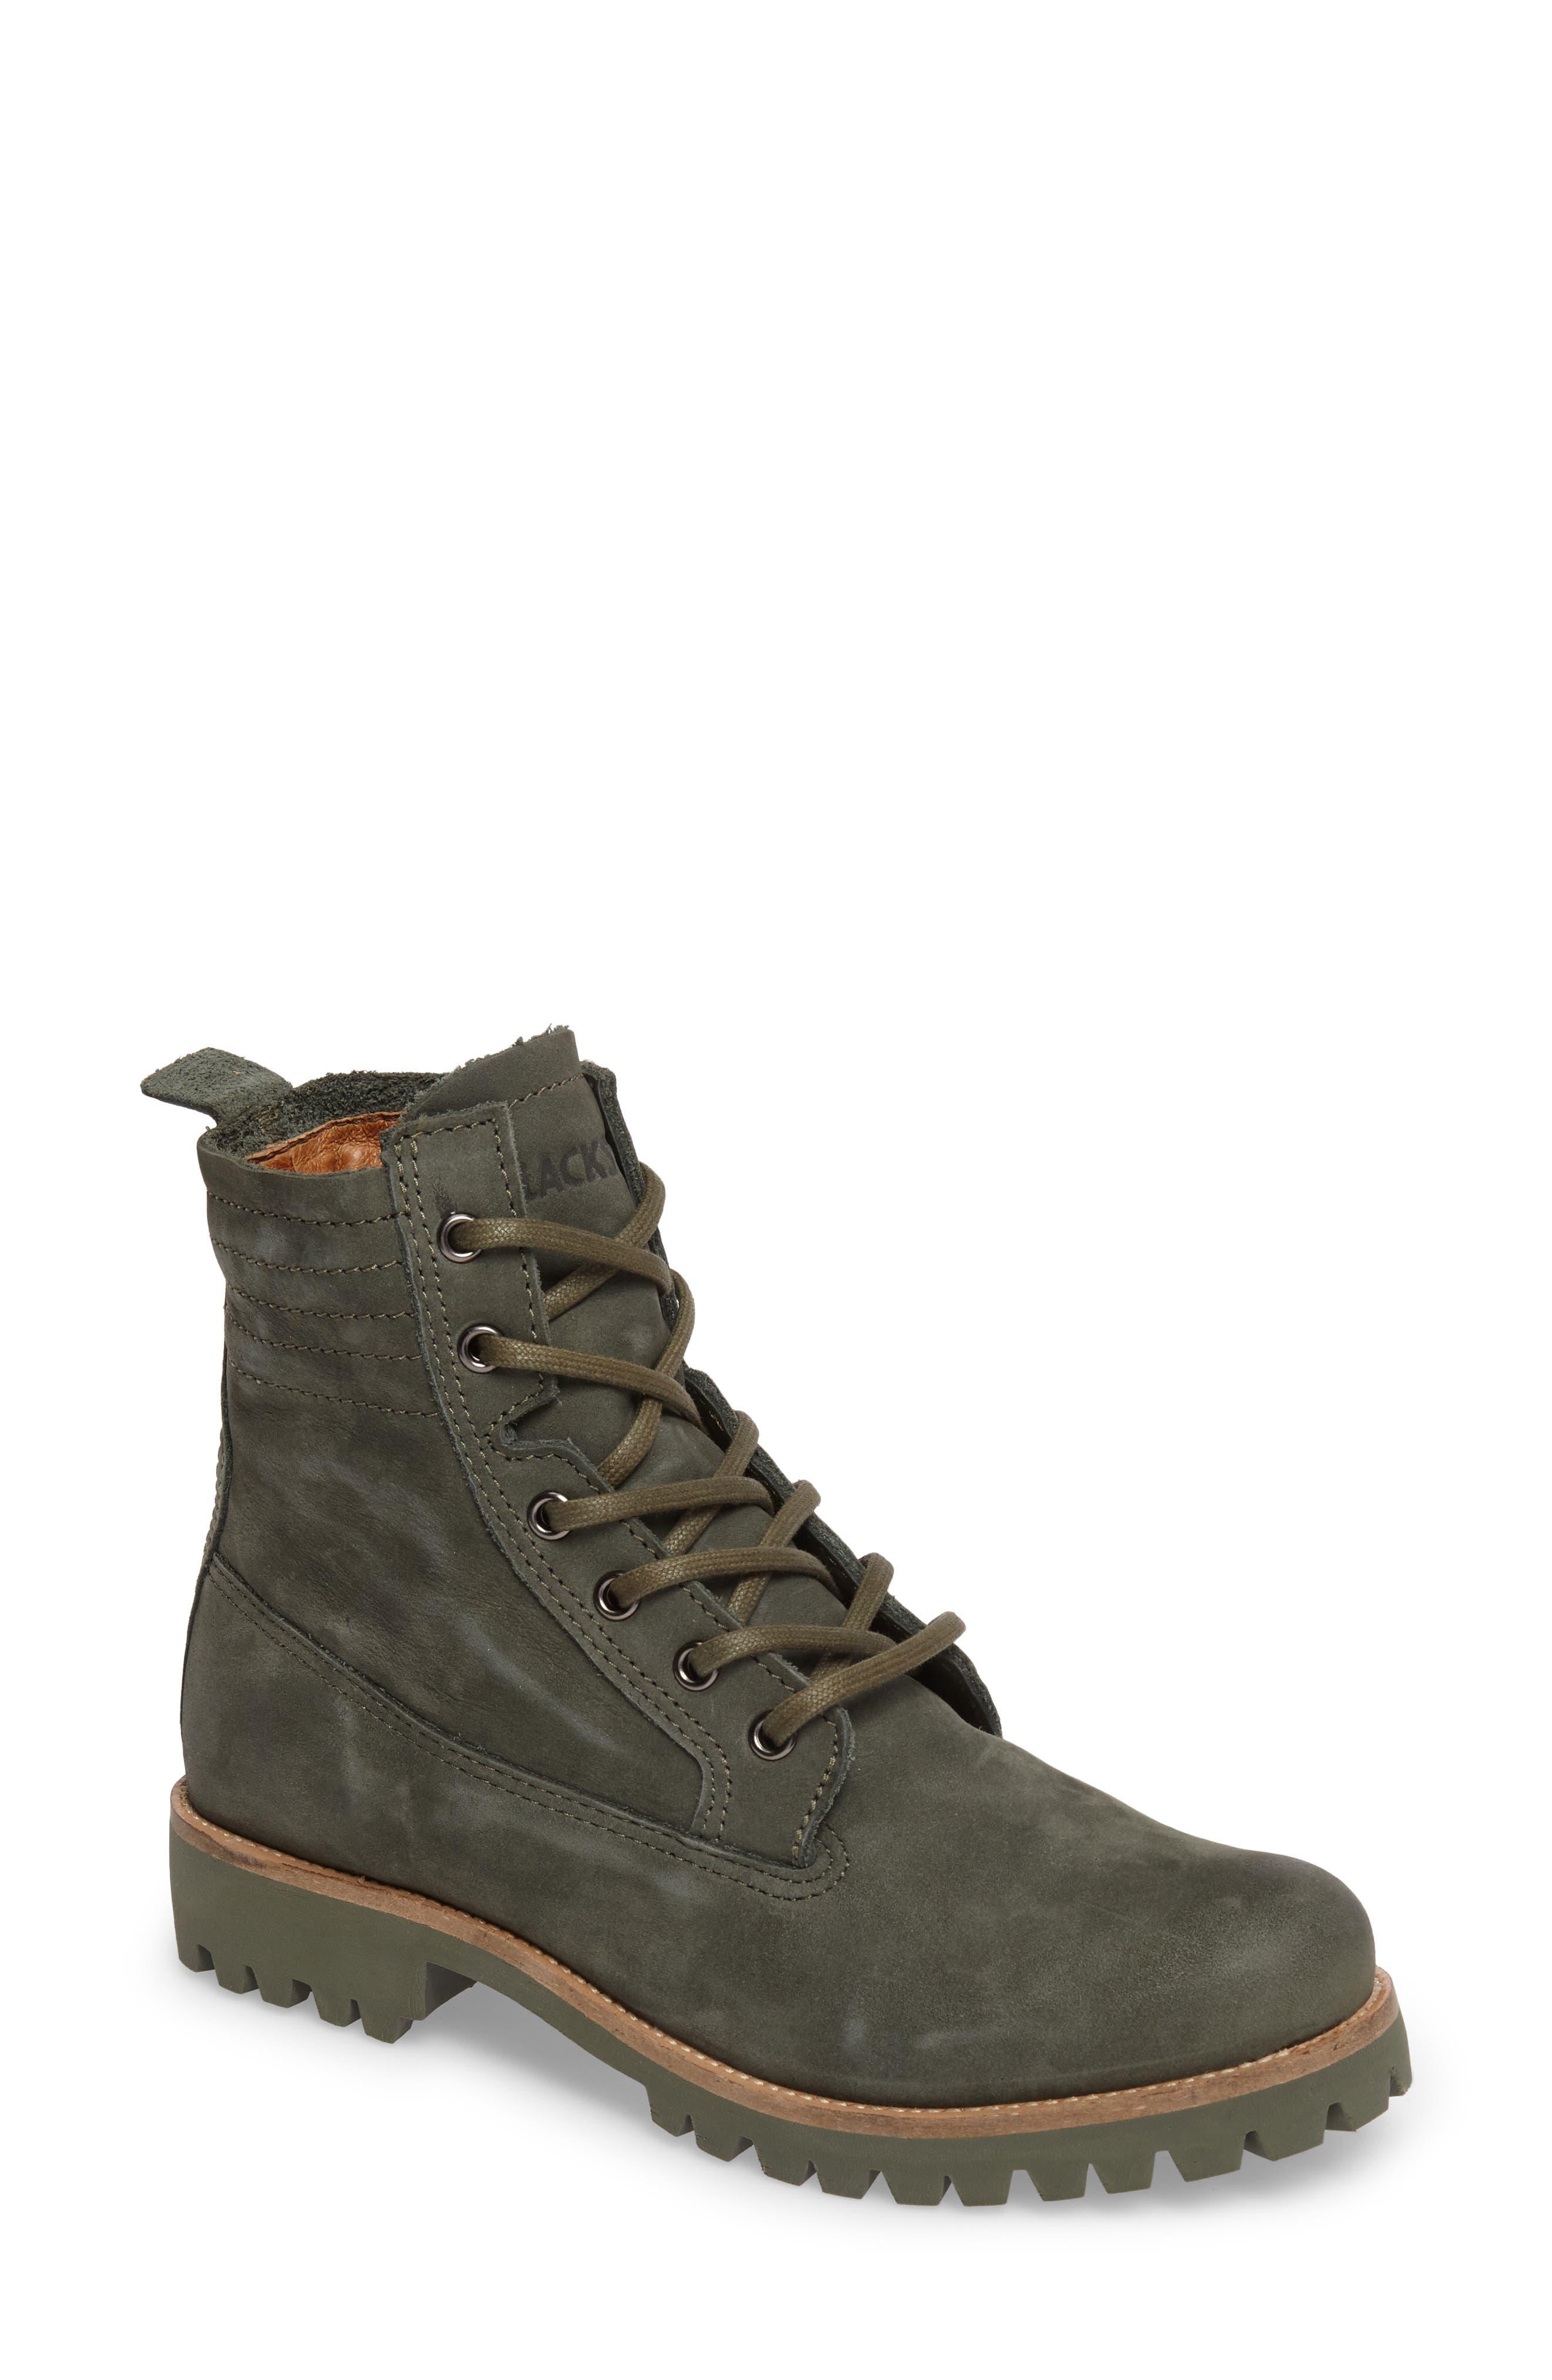 Main Image - Blackstone OL23 Lace-Up Boot (Women)